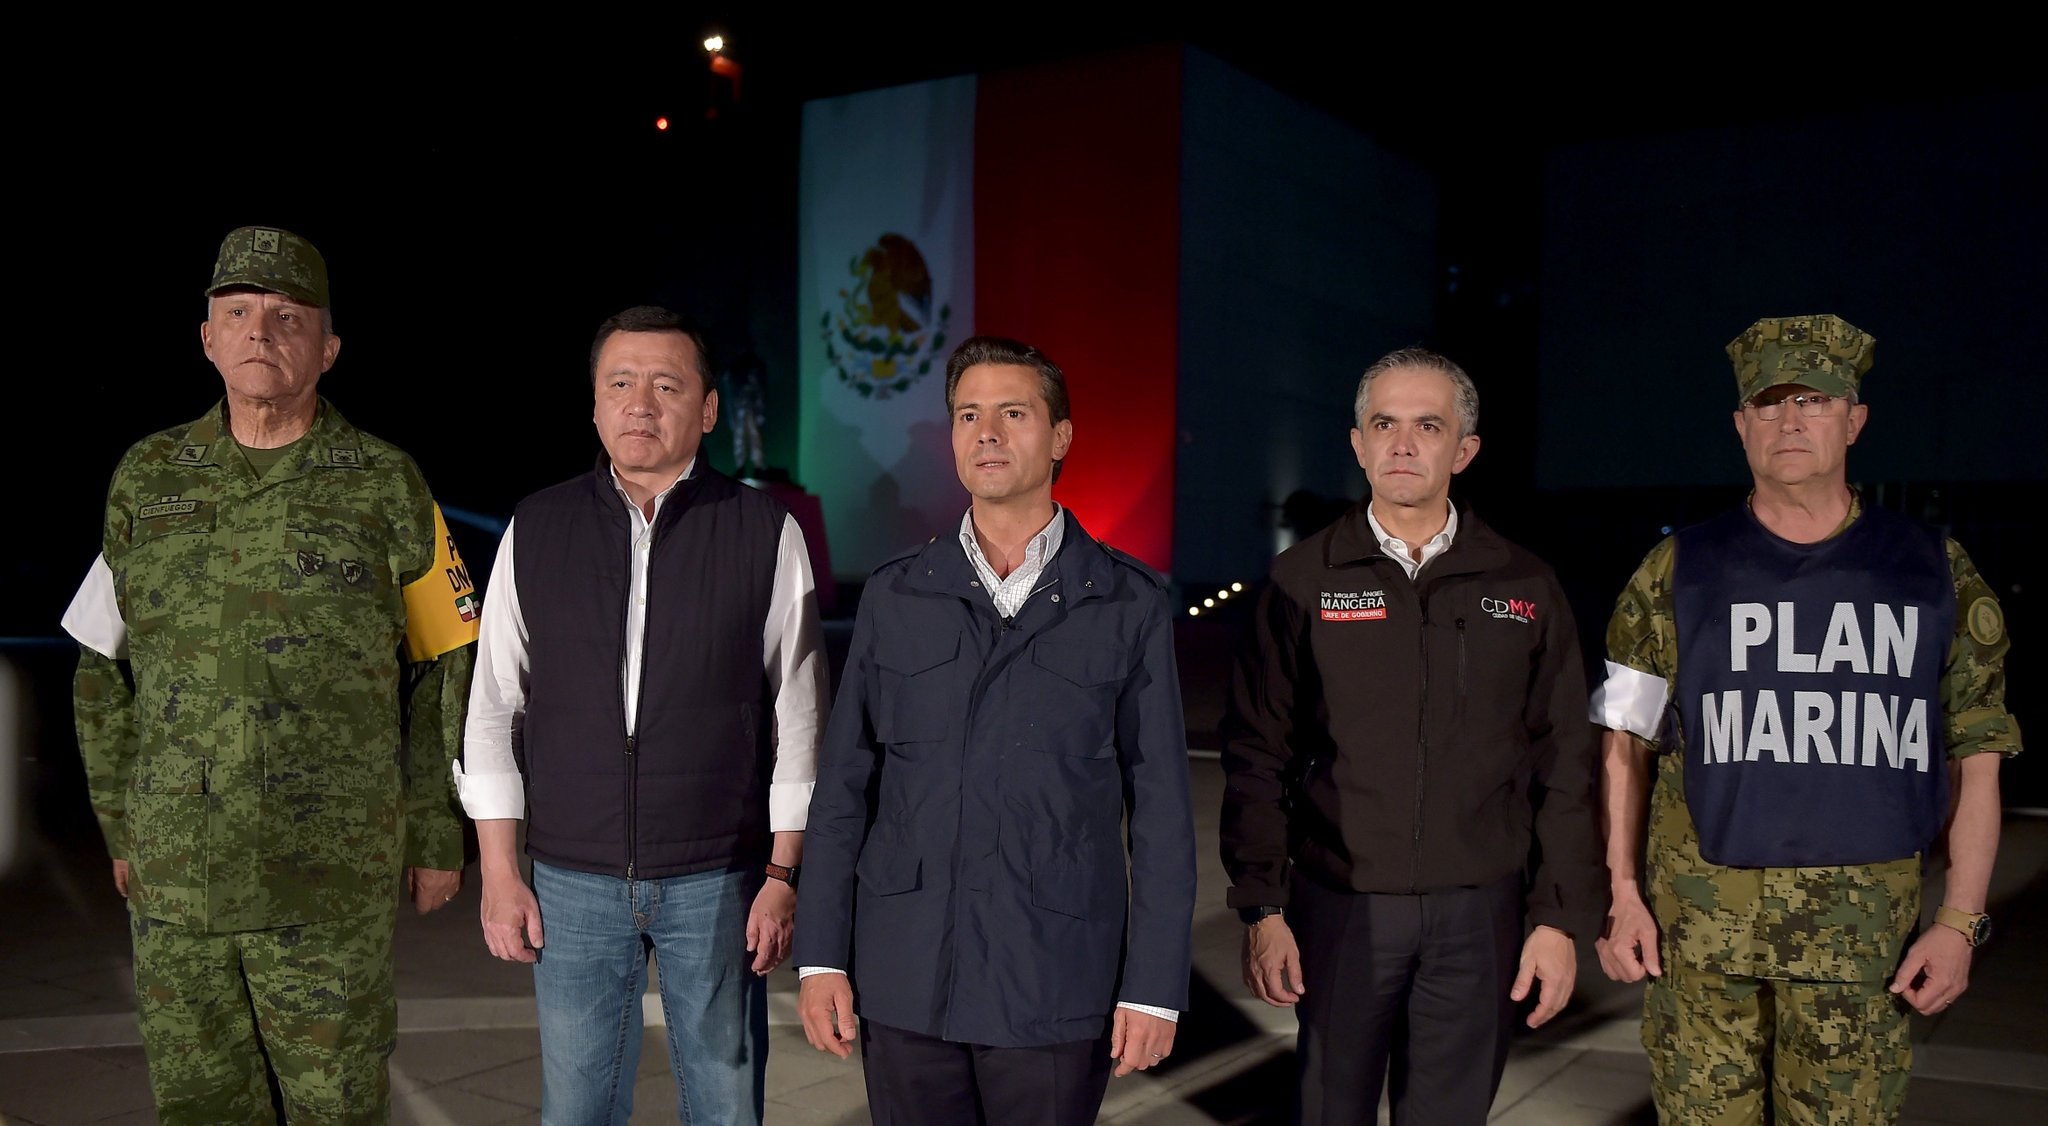 Mensaje del Presidente @EPN por sismo del 19 de septiembre 2017. #FuerzaMéxico  https://t.co/j4G8I7EDyq https://t.co/MHthXGMXH2